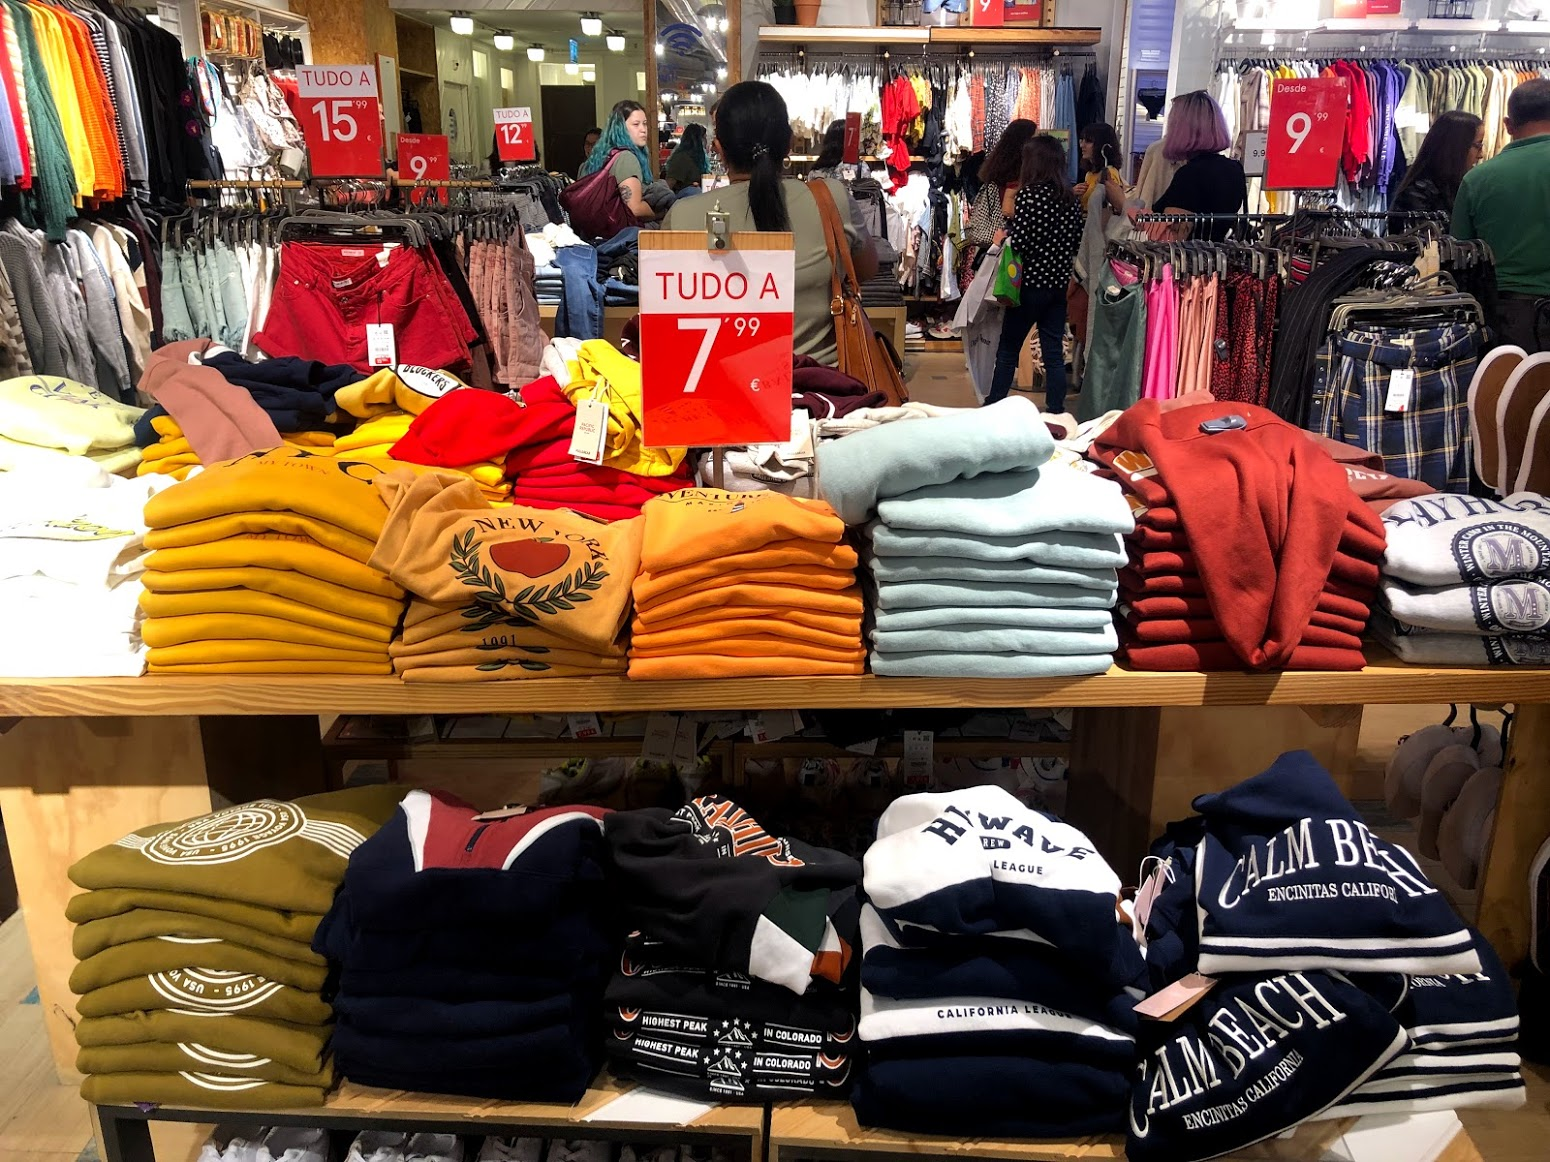 Compras em Portugal: Pull & Bear